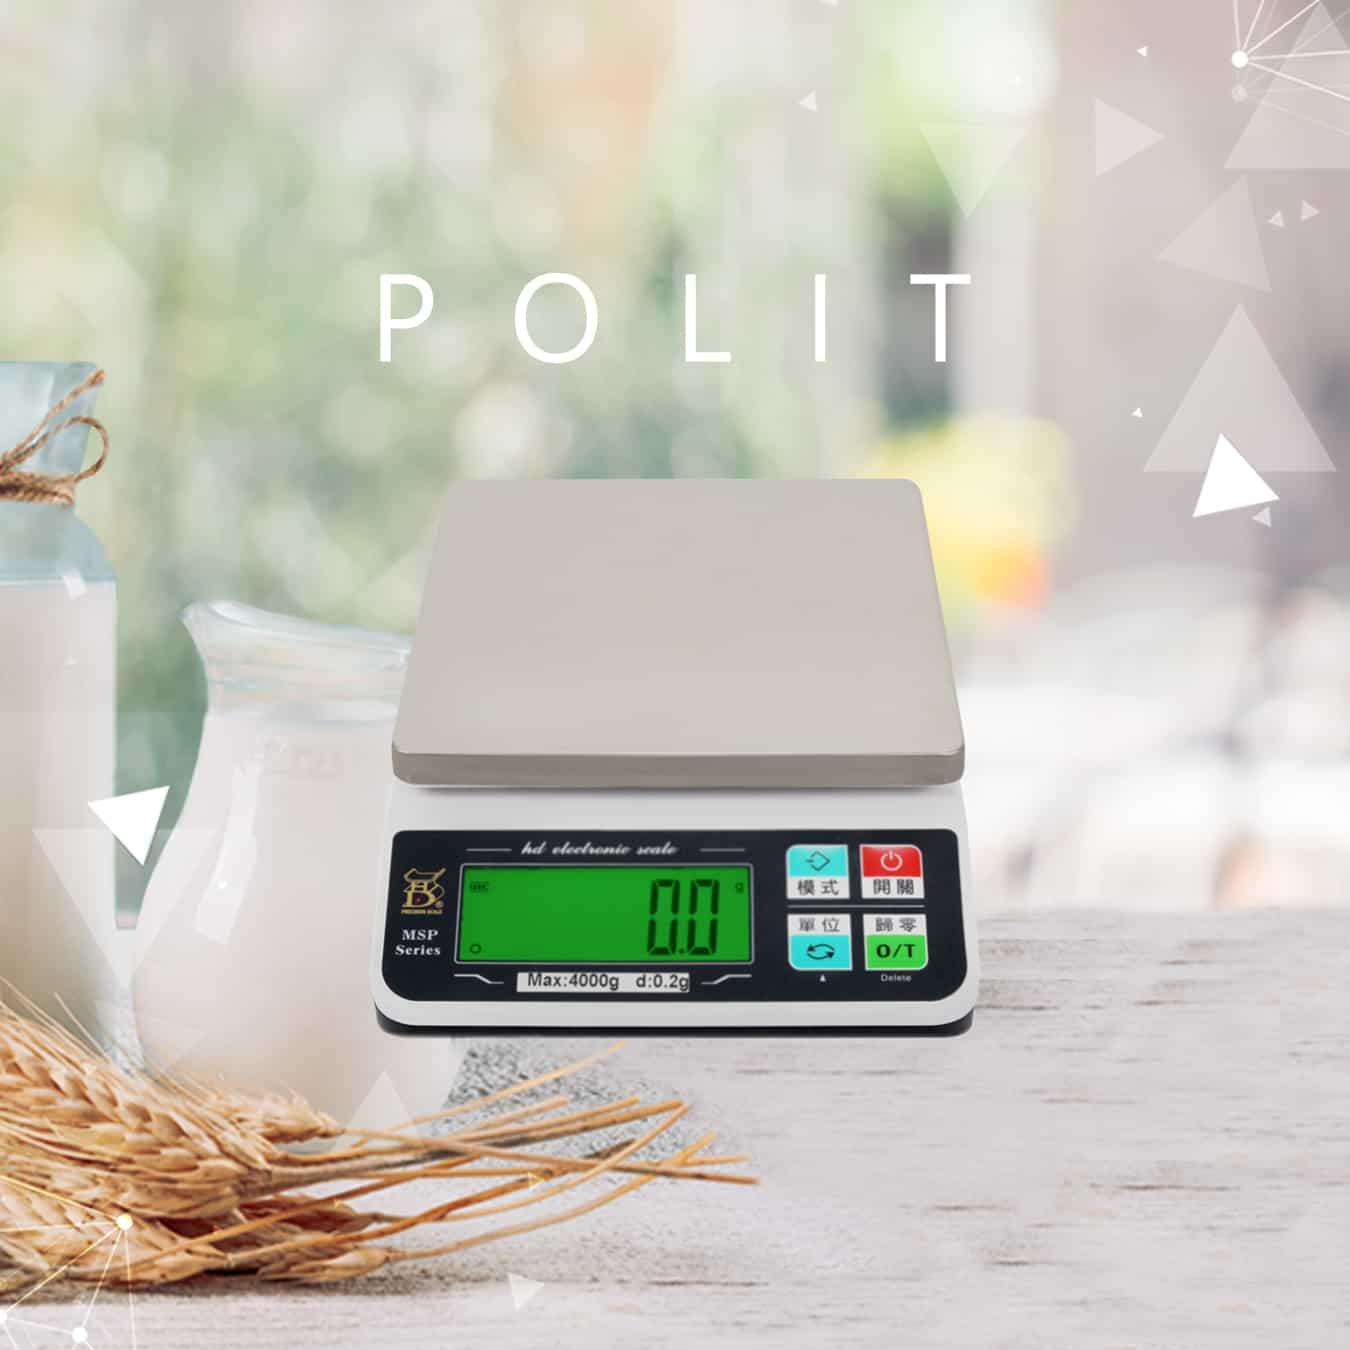 MSP電子秤 料理秤 烘焙秤 | 沛禮國際 Polit 電子秤專賣